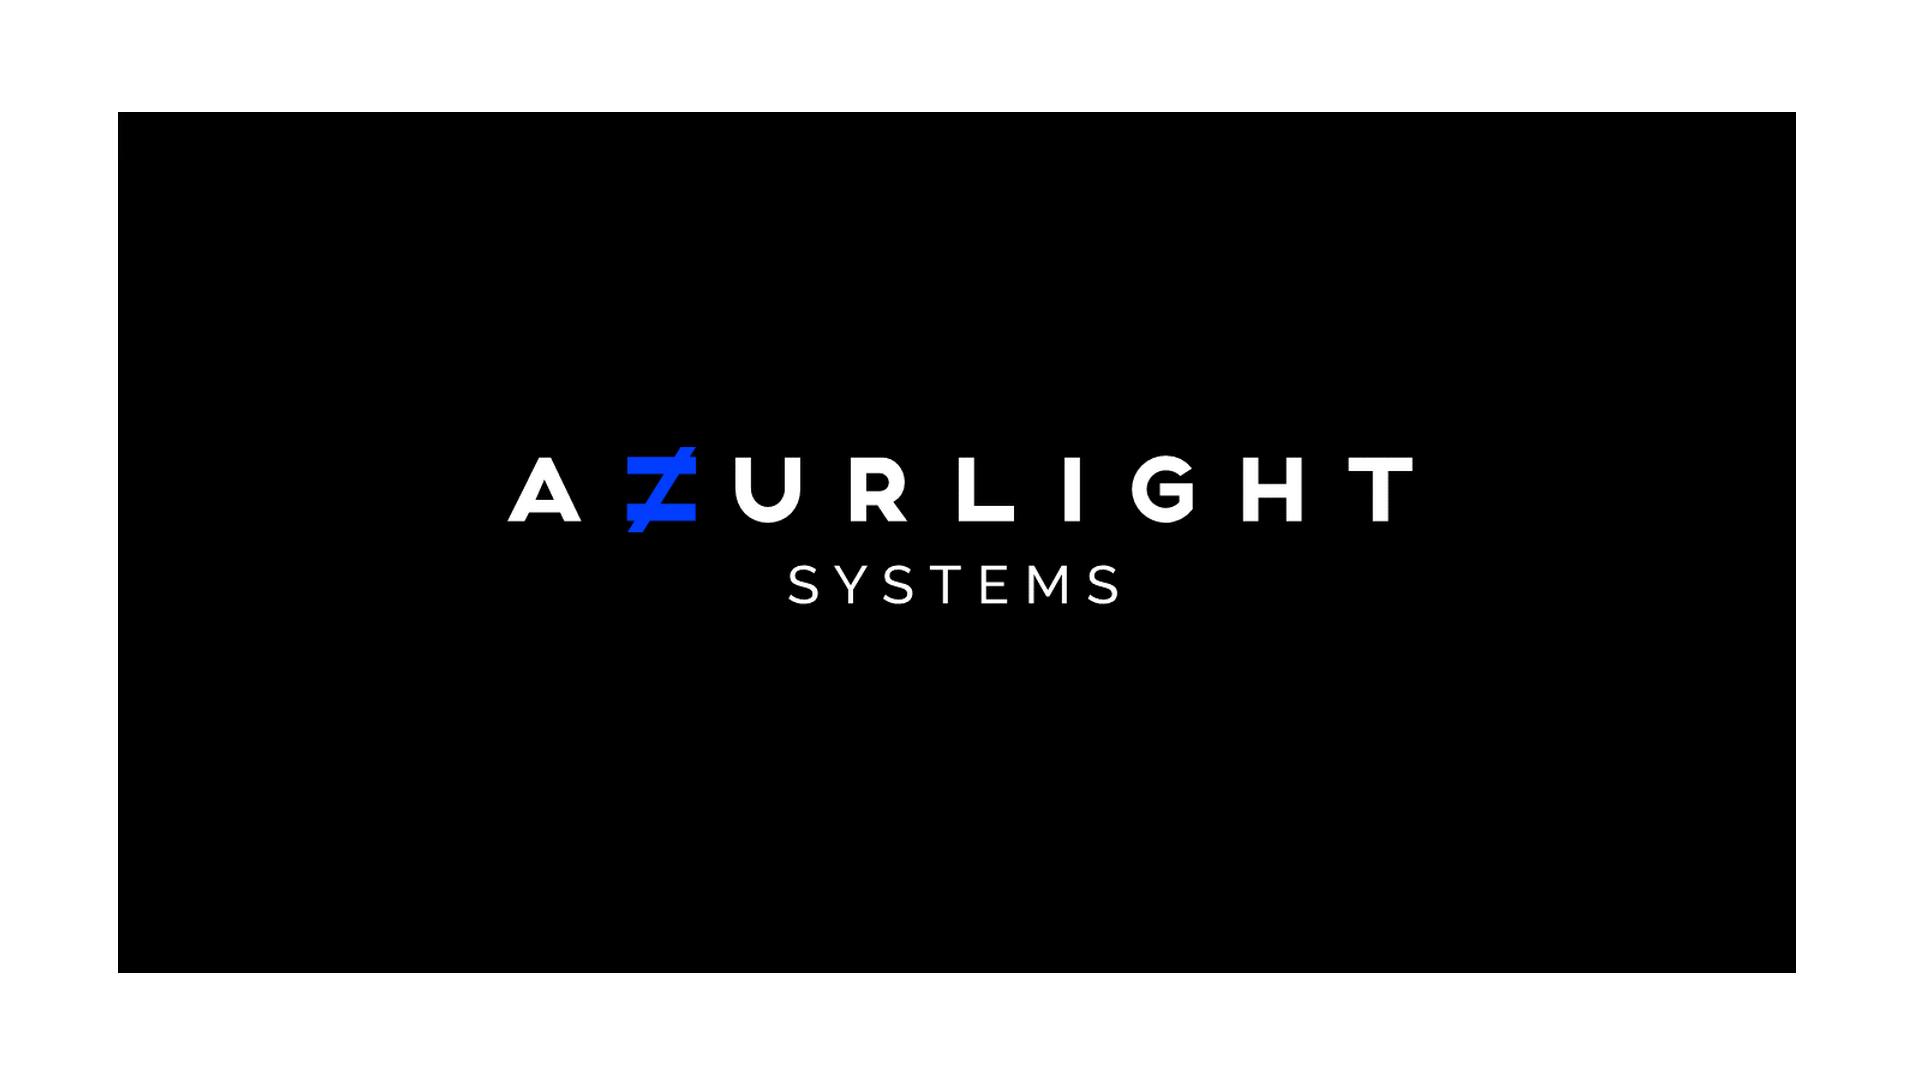 Azurlight Systems New Visual Identity Logo Rebranding Graphic Design Graphism